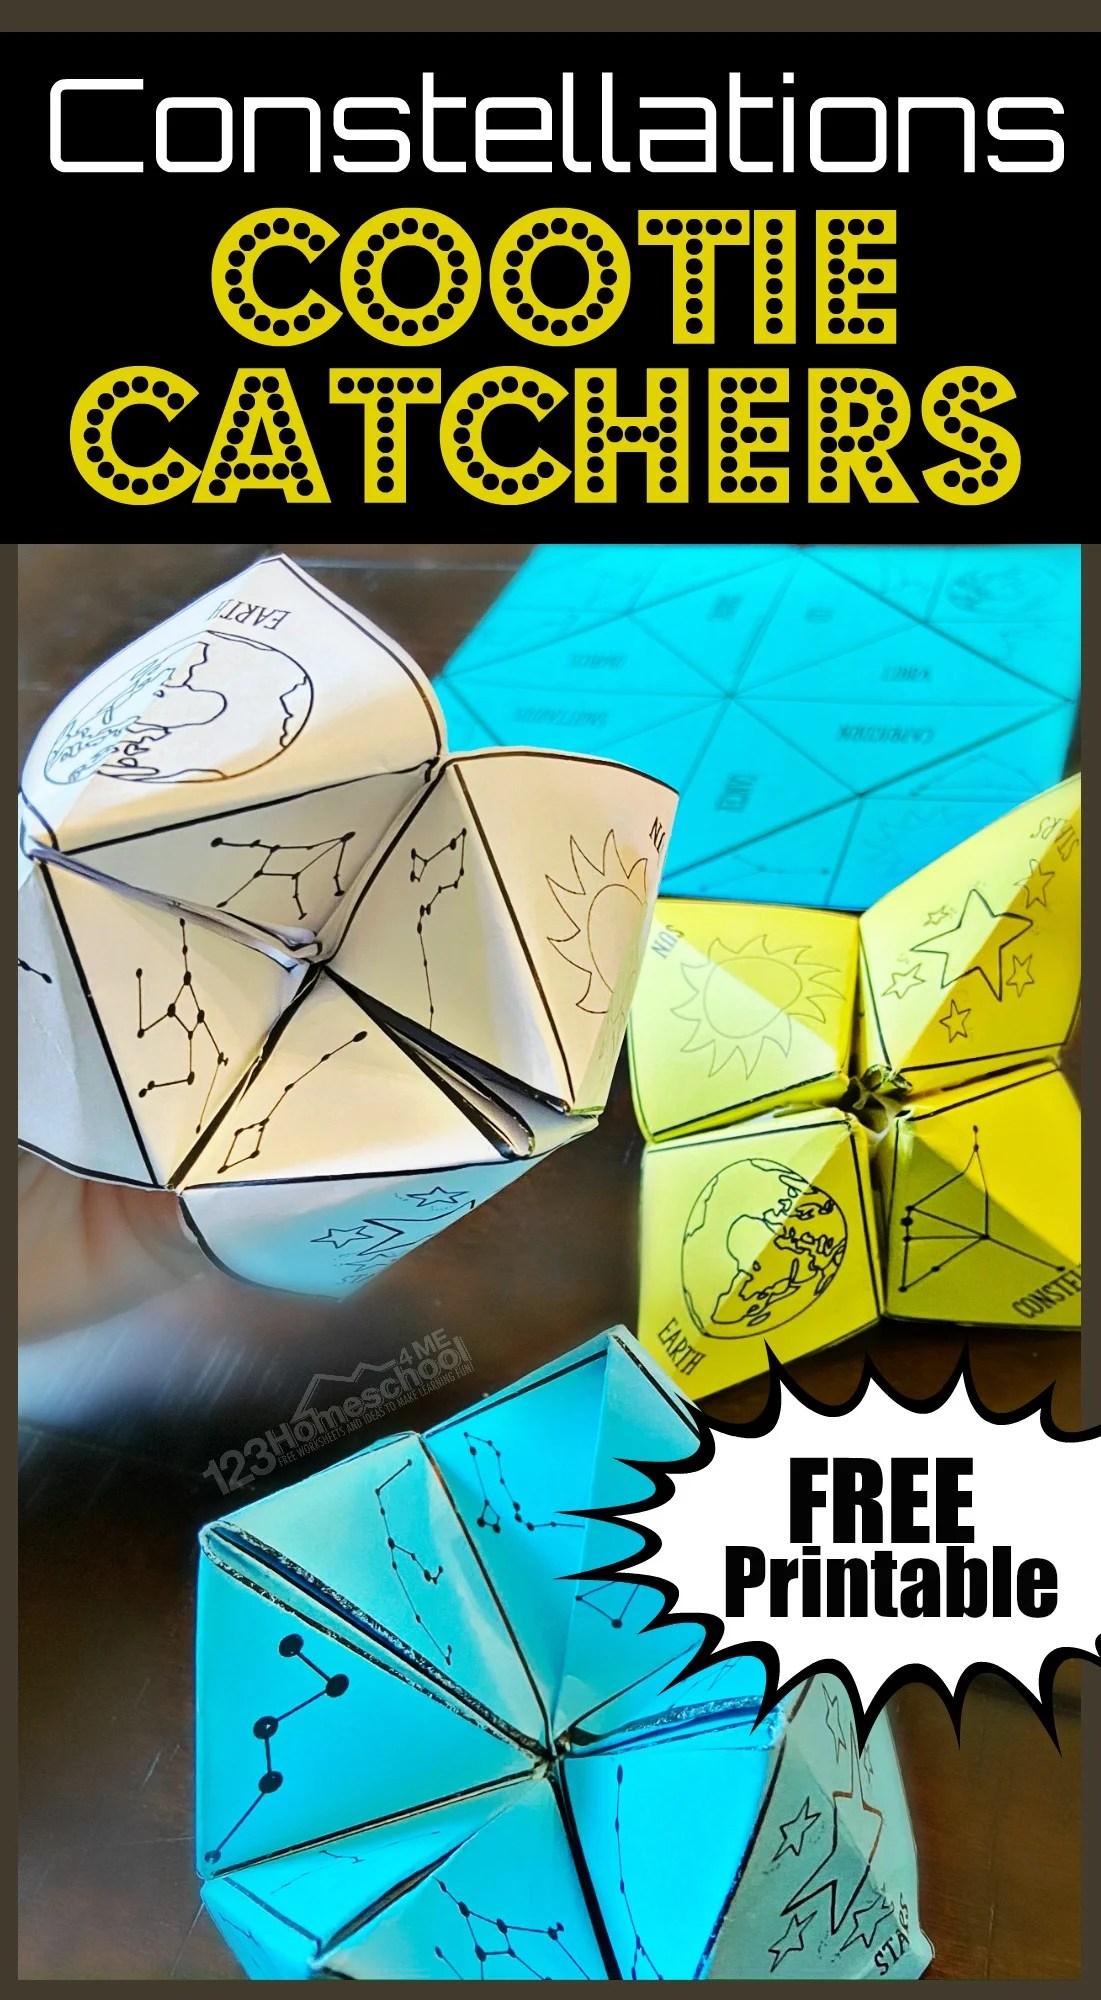 Free Cootie Catcher Constellations Printable